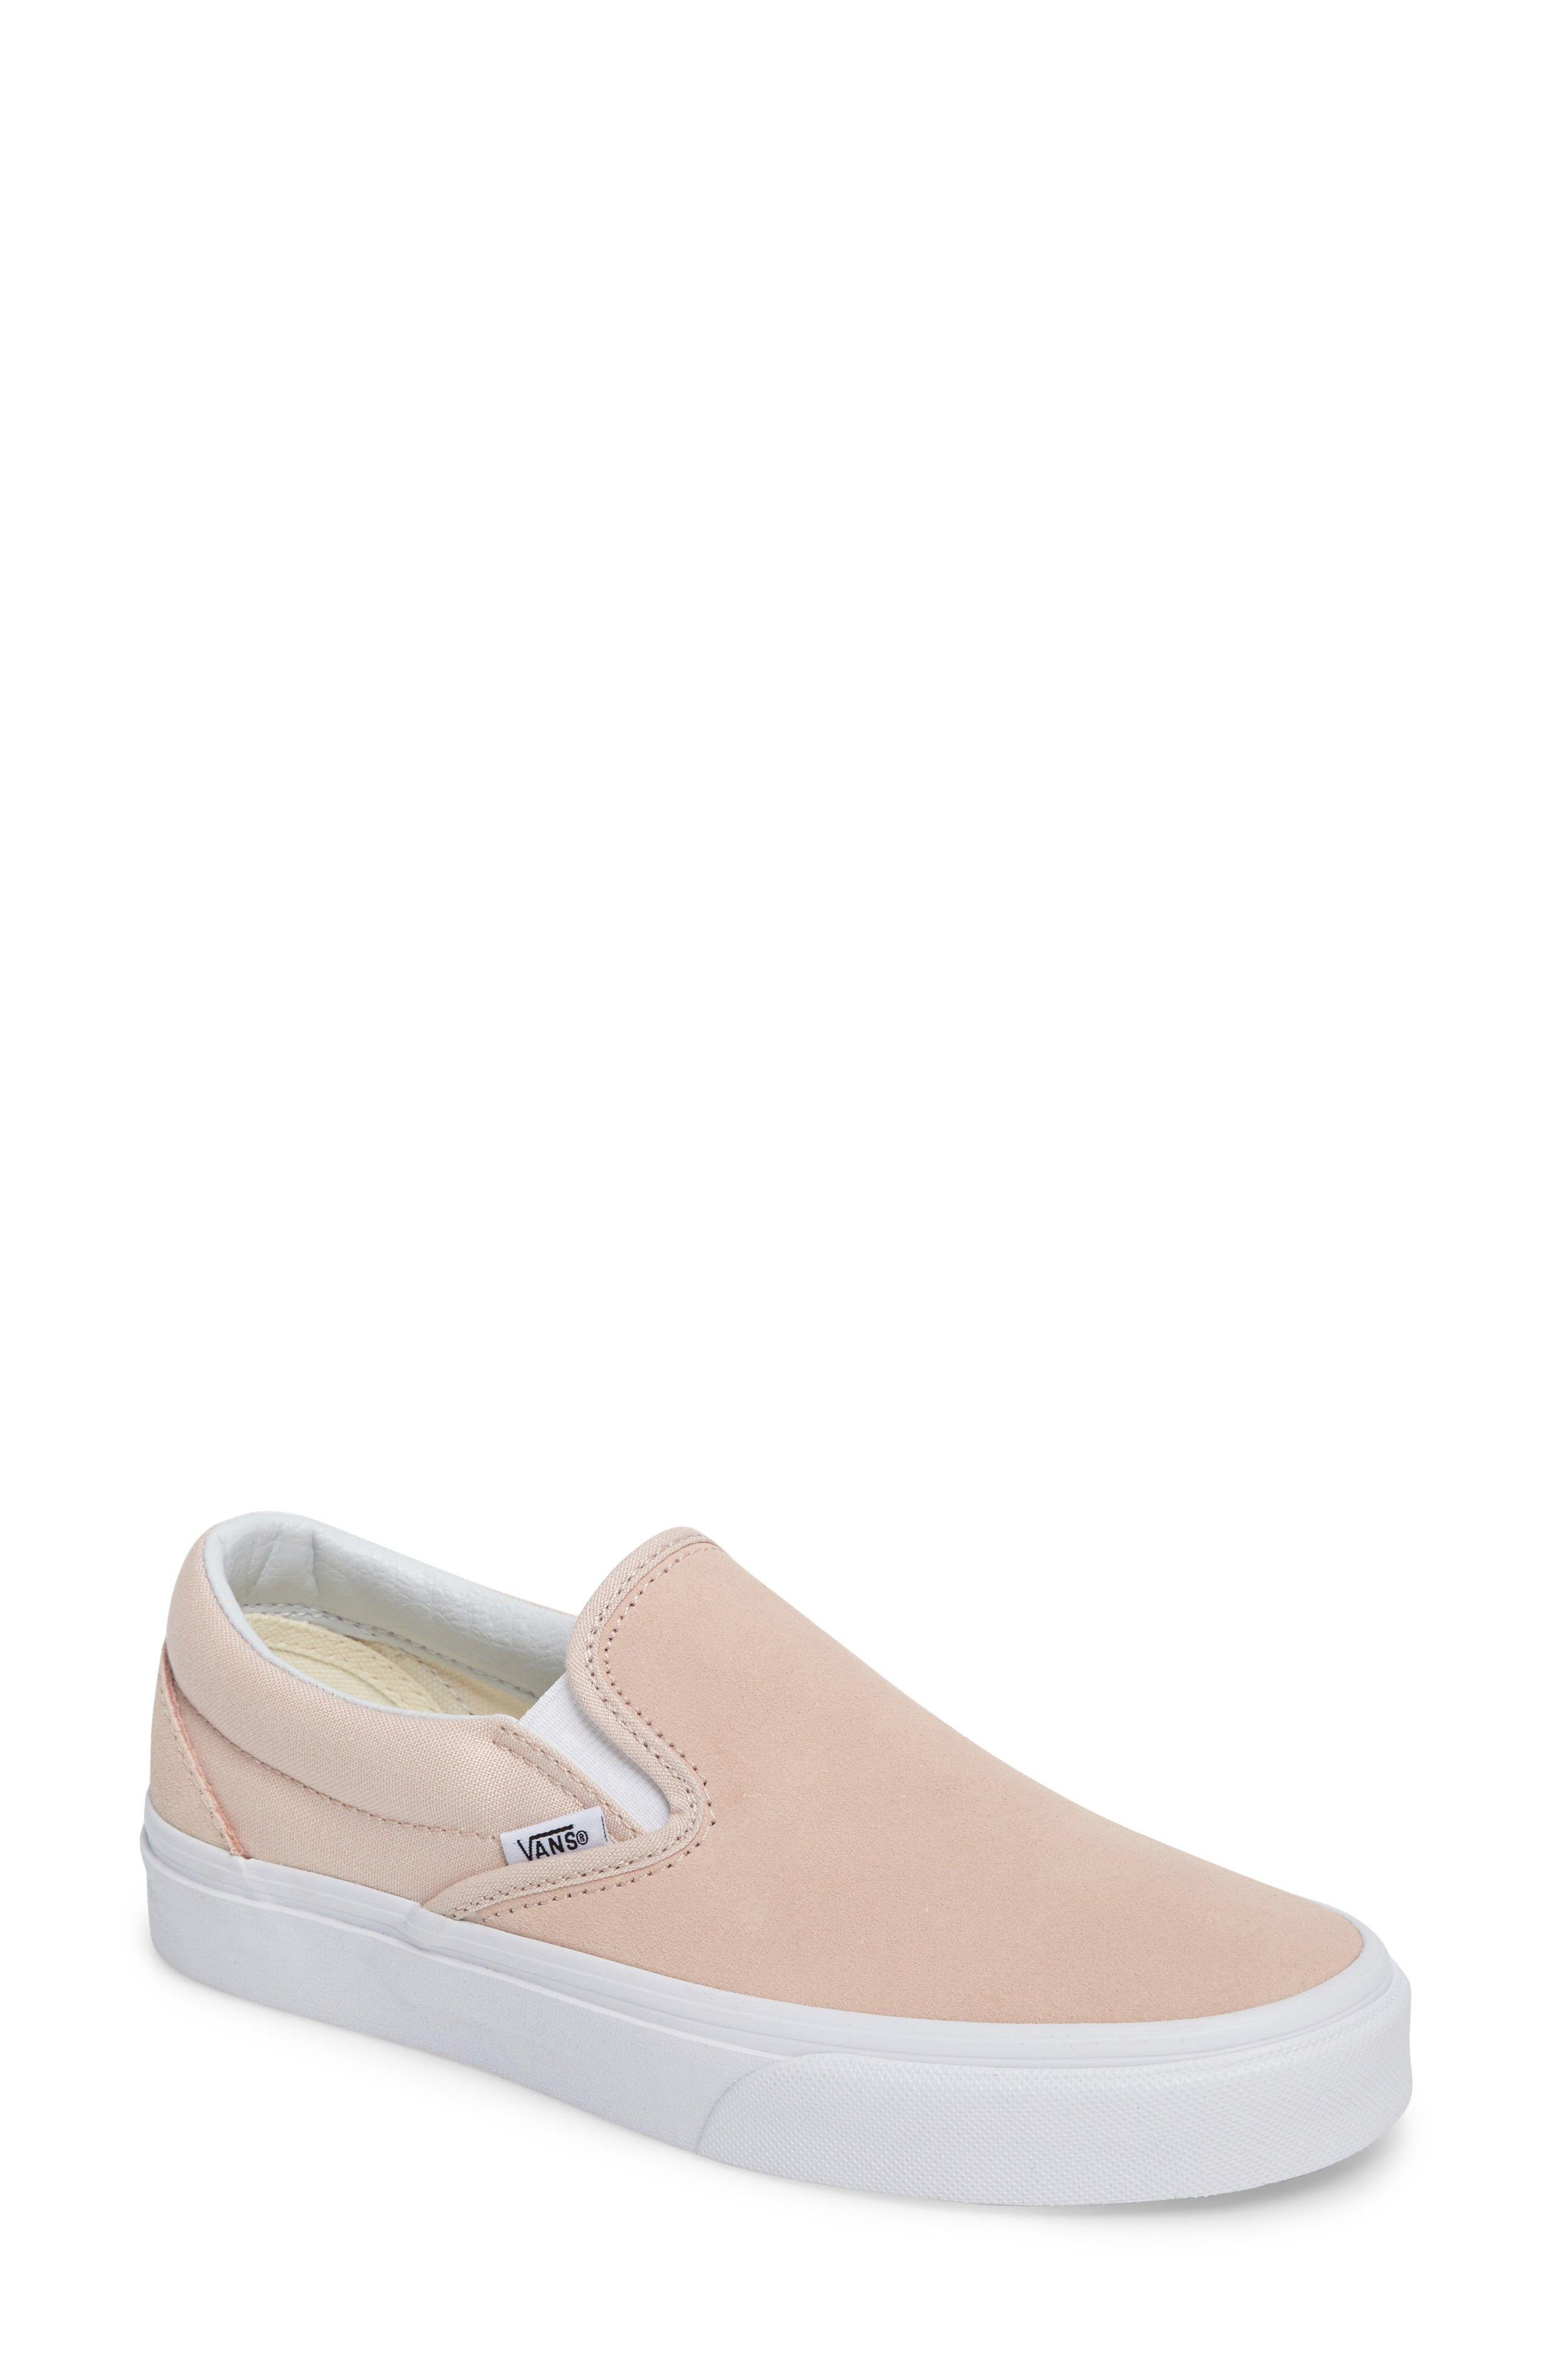 739ea3e1f19 vans rose suede classic slip-on sneaker